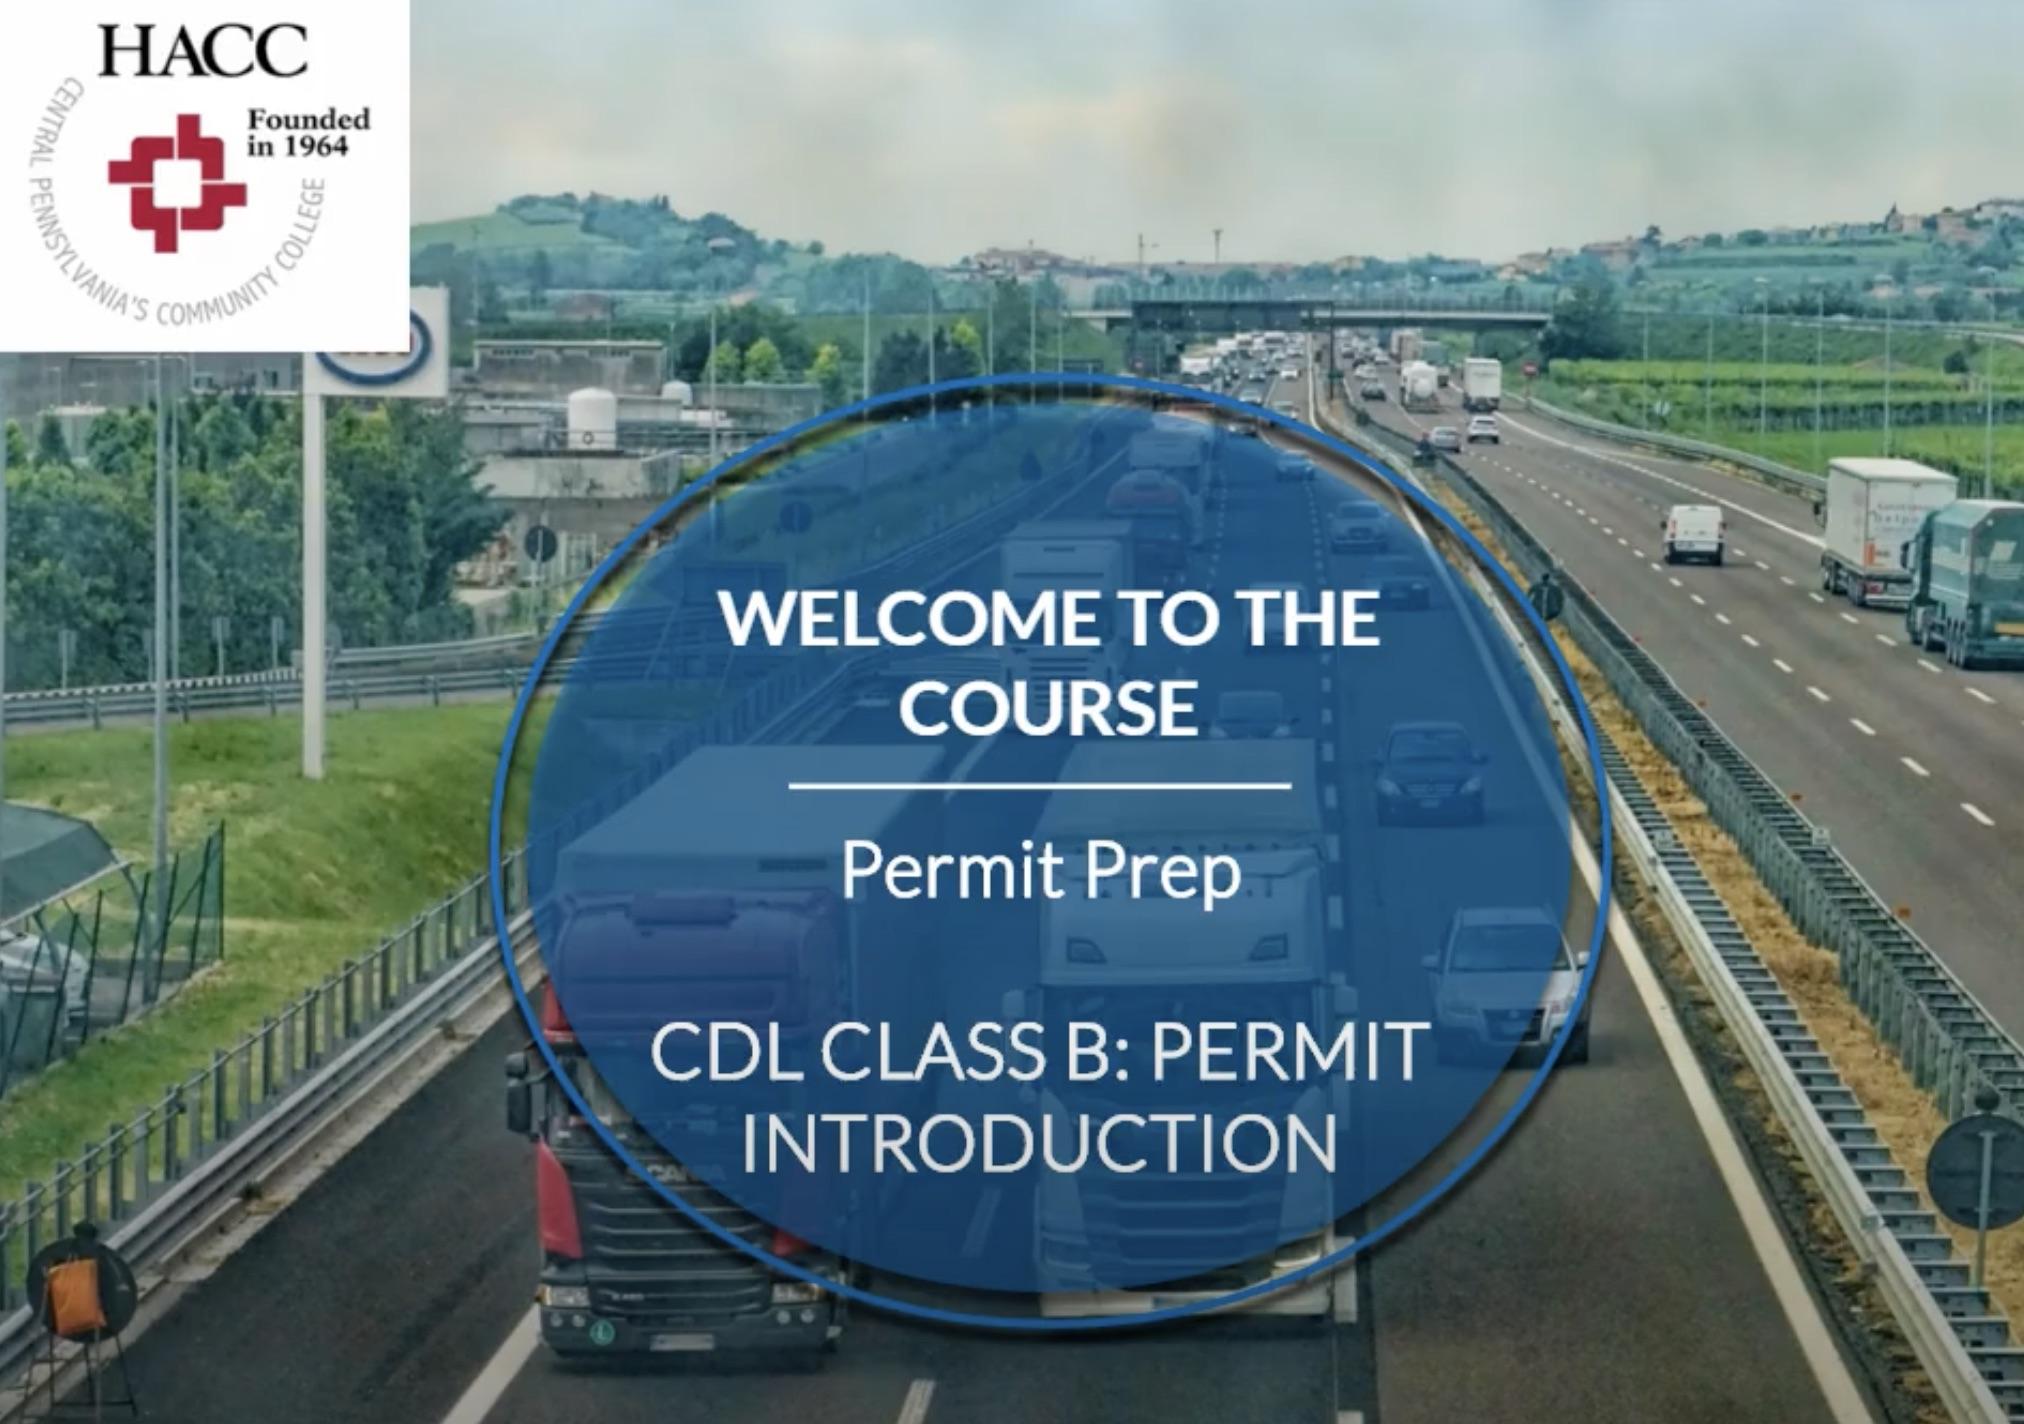 CDL Class B: Permit Prep (CE001_CRN60757)